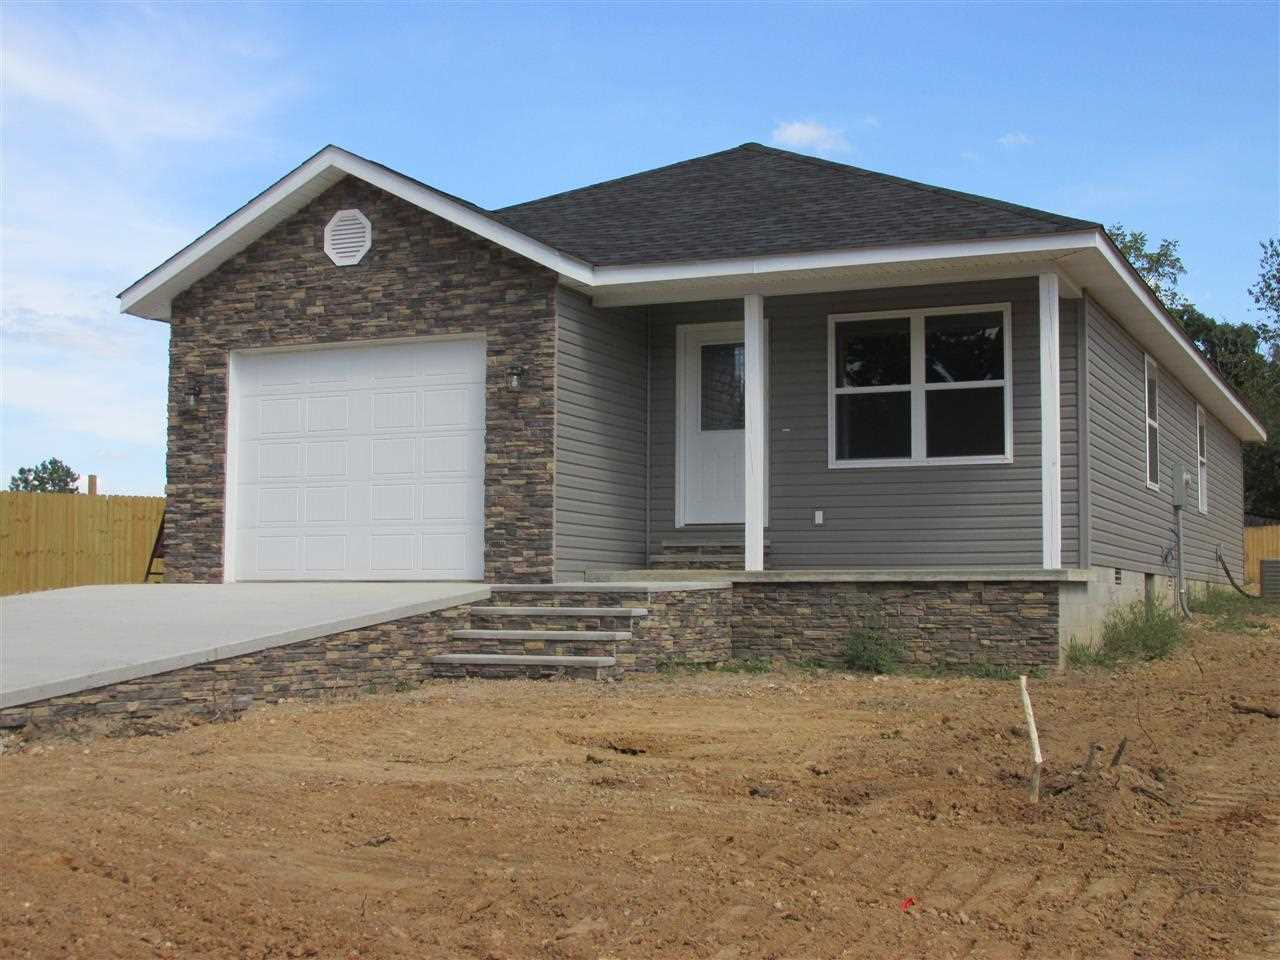 Real Estate for Sale, ListingId: 31761588, Ellsinore,MO63937